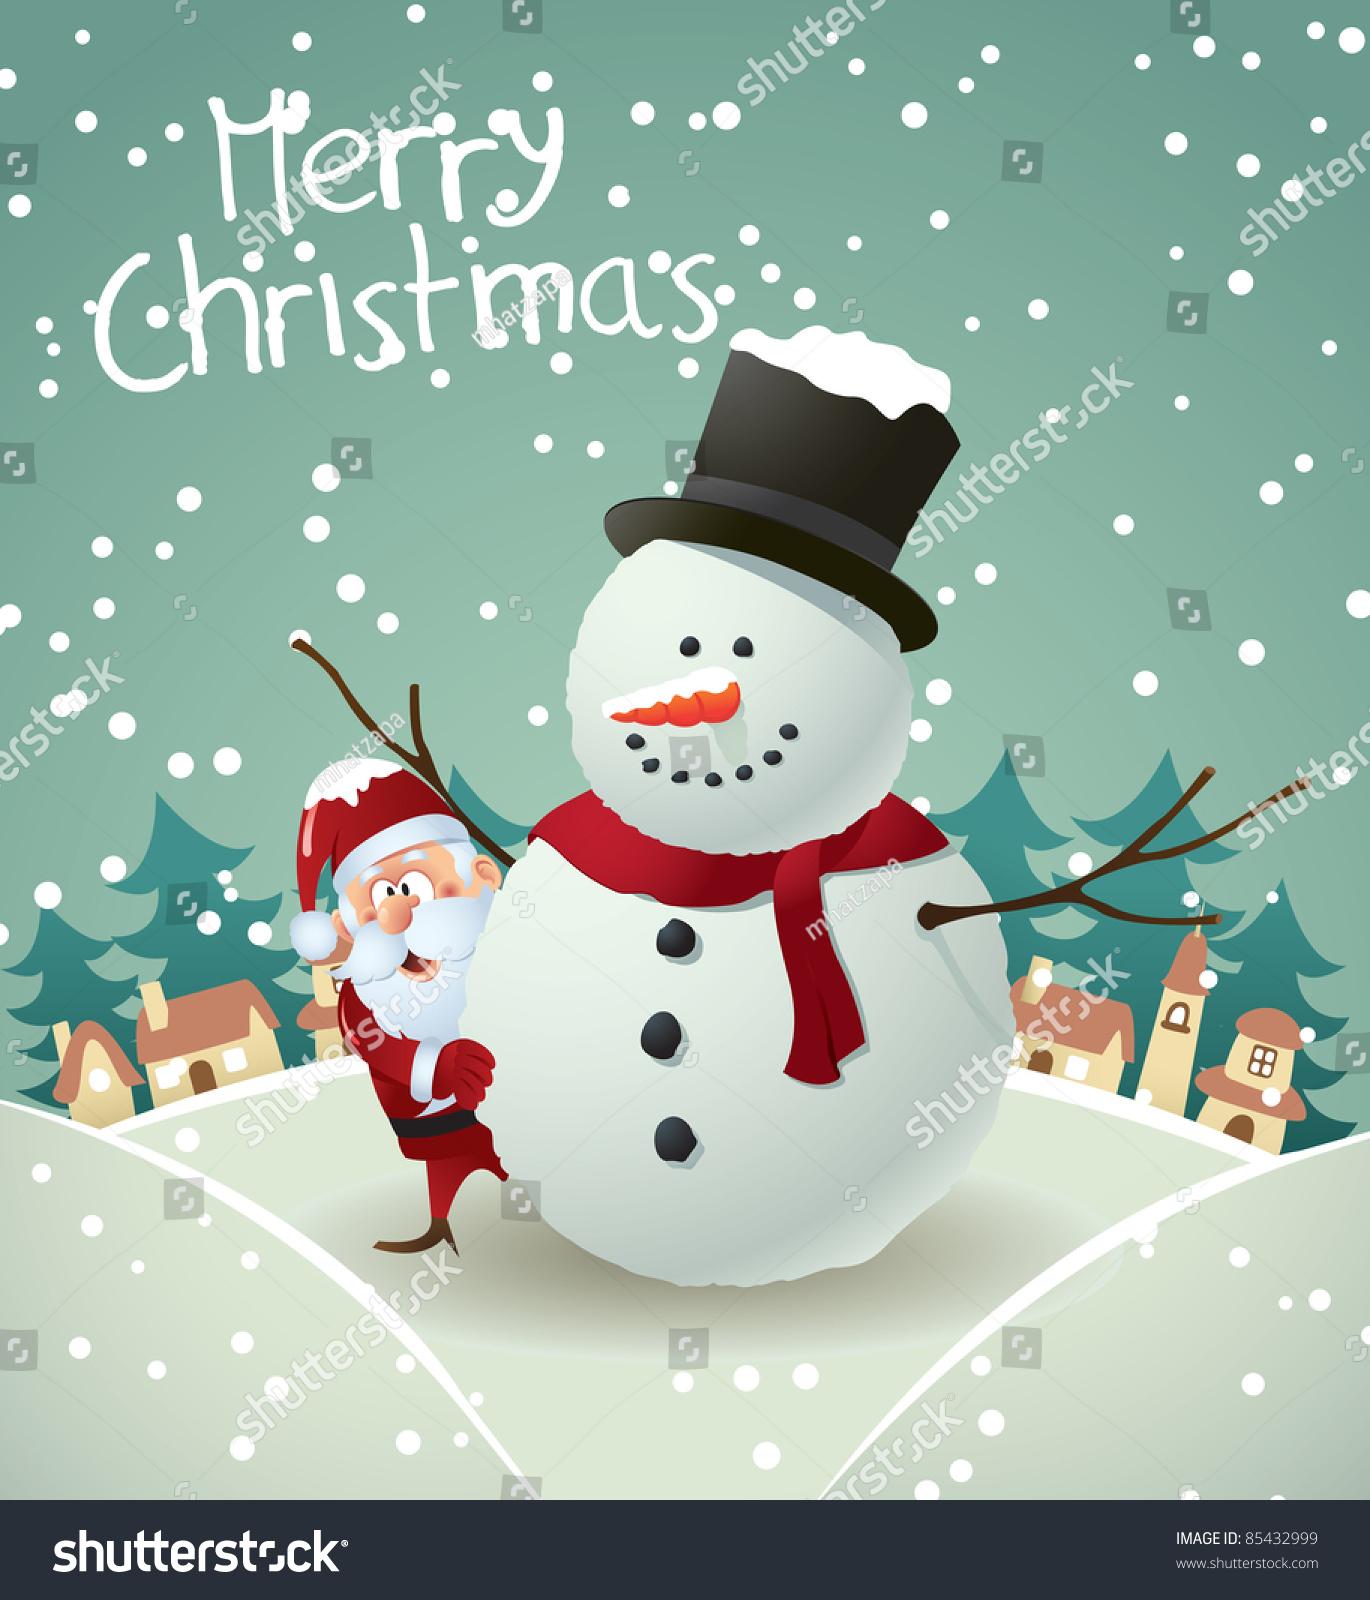 Santa And Snowman Christmas Card Stock Vector Illustration 85432999 : Shutter...